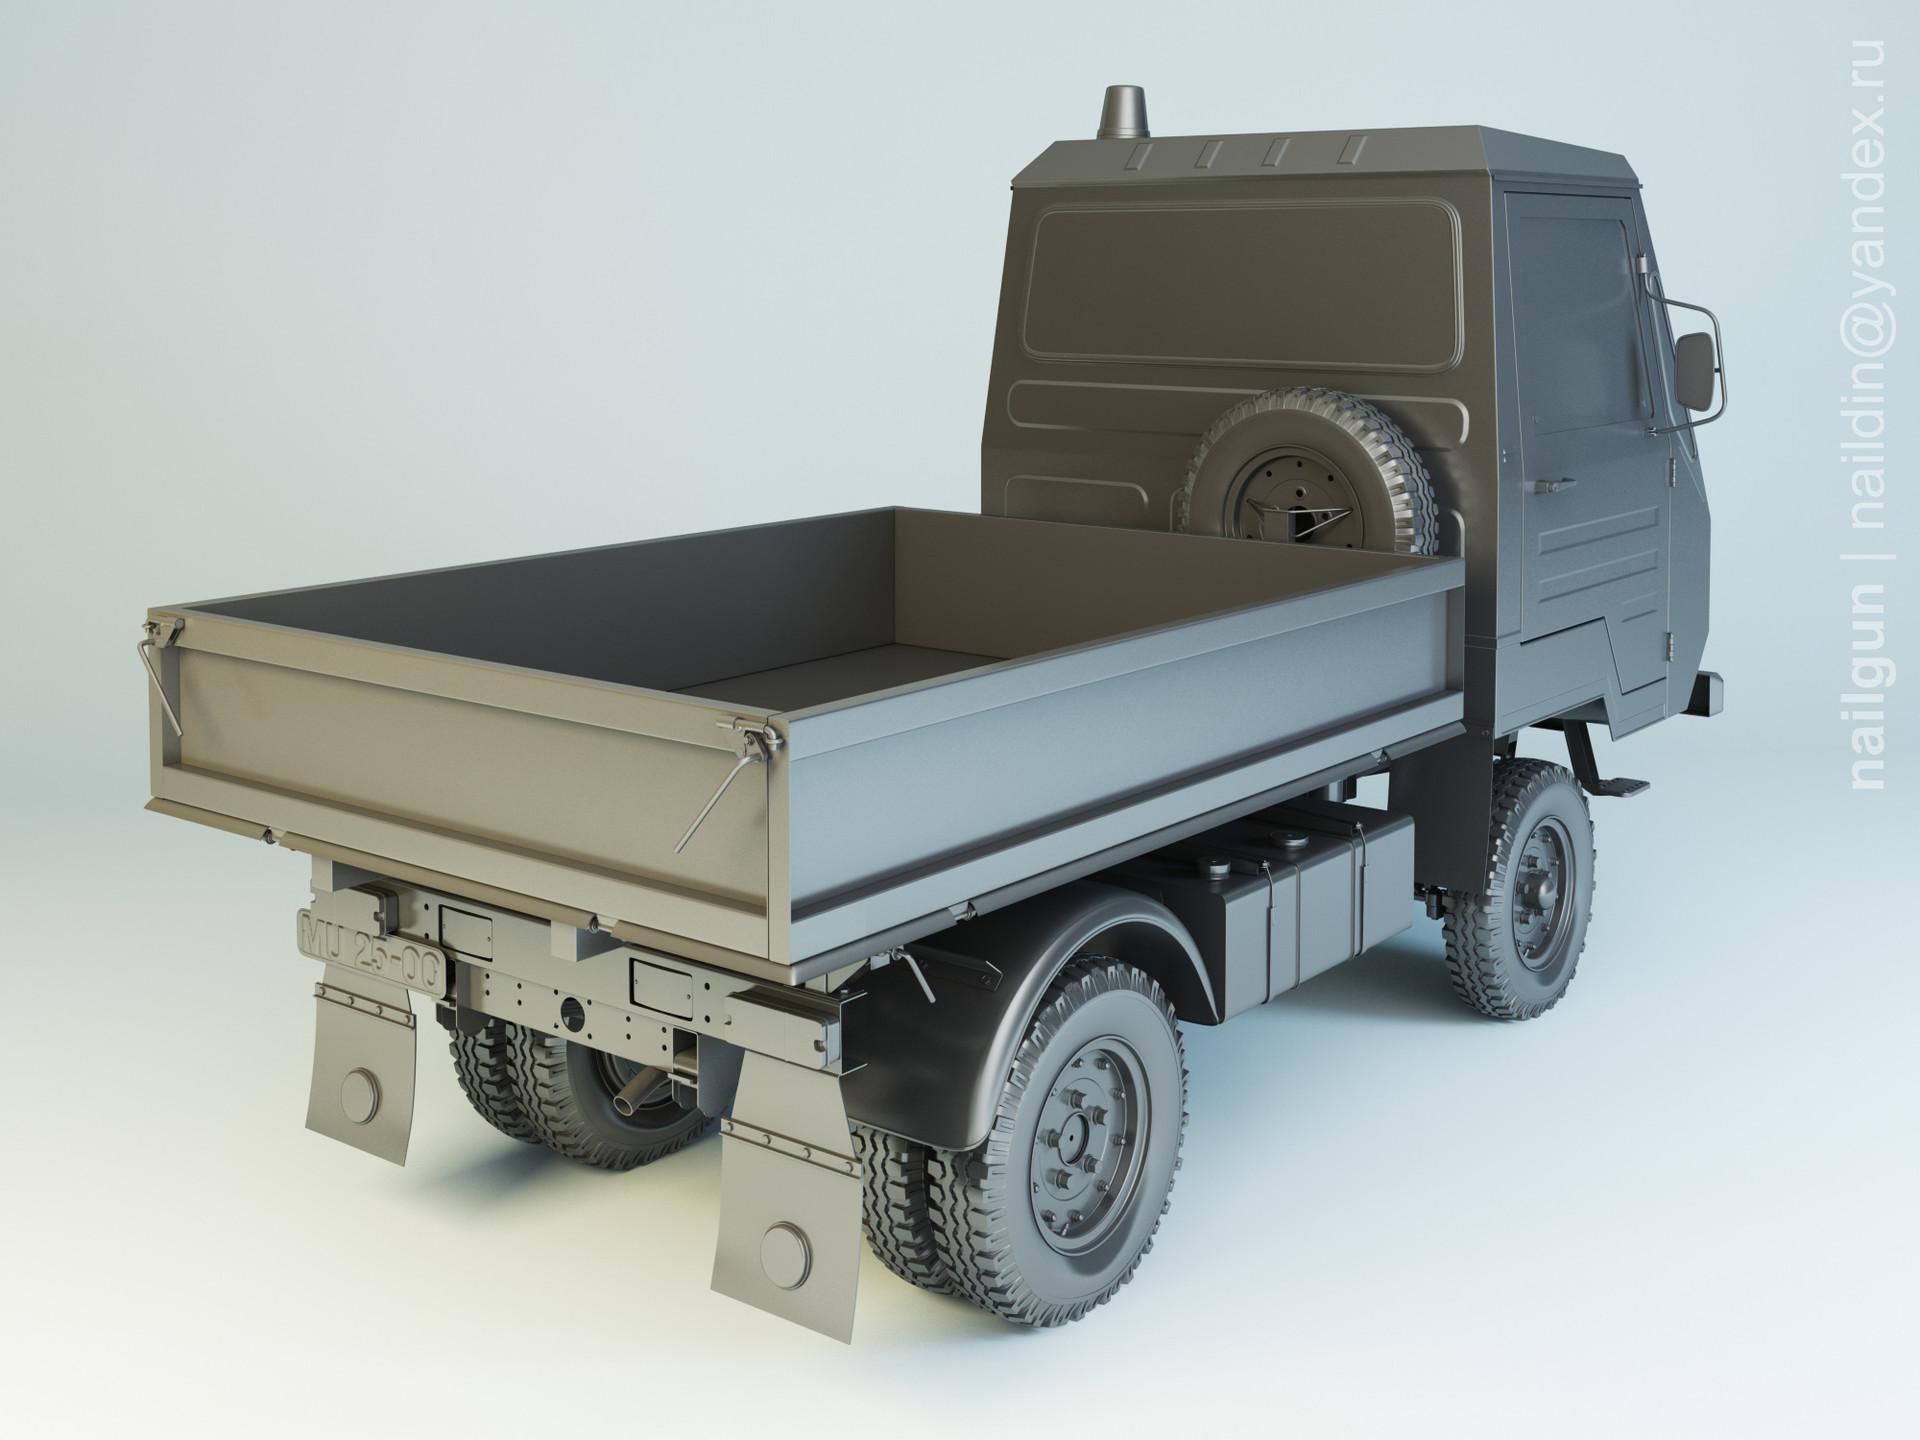 Nail khusnutdinov als 167 002 multicar m25 modelling 1